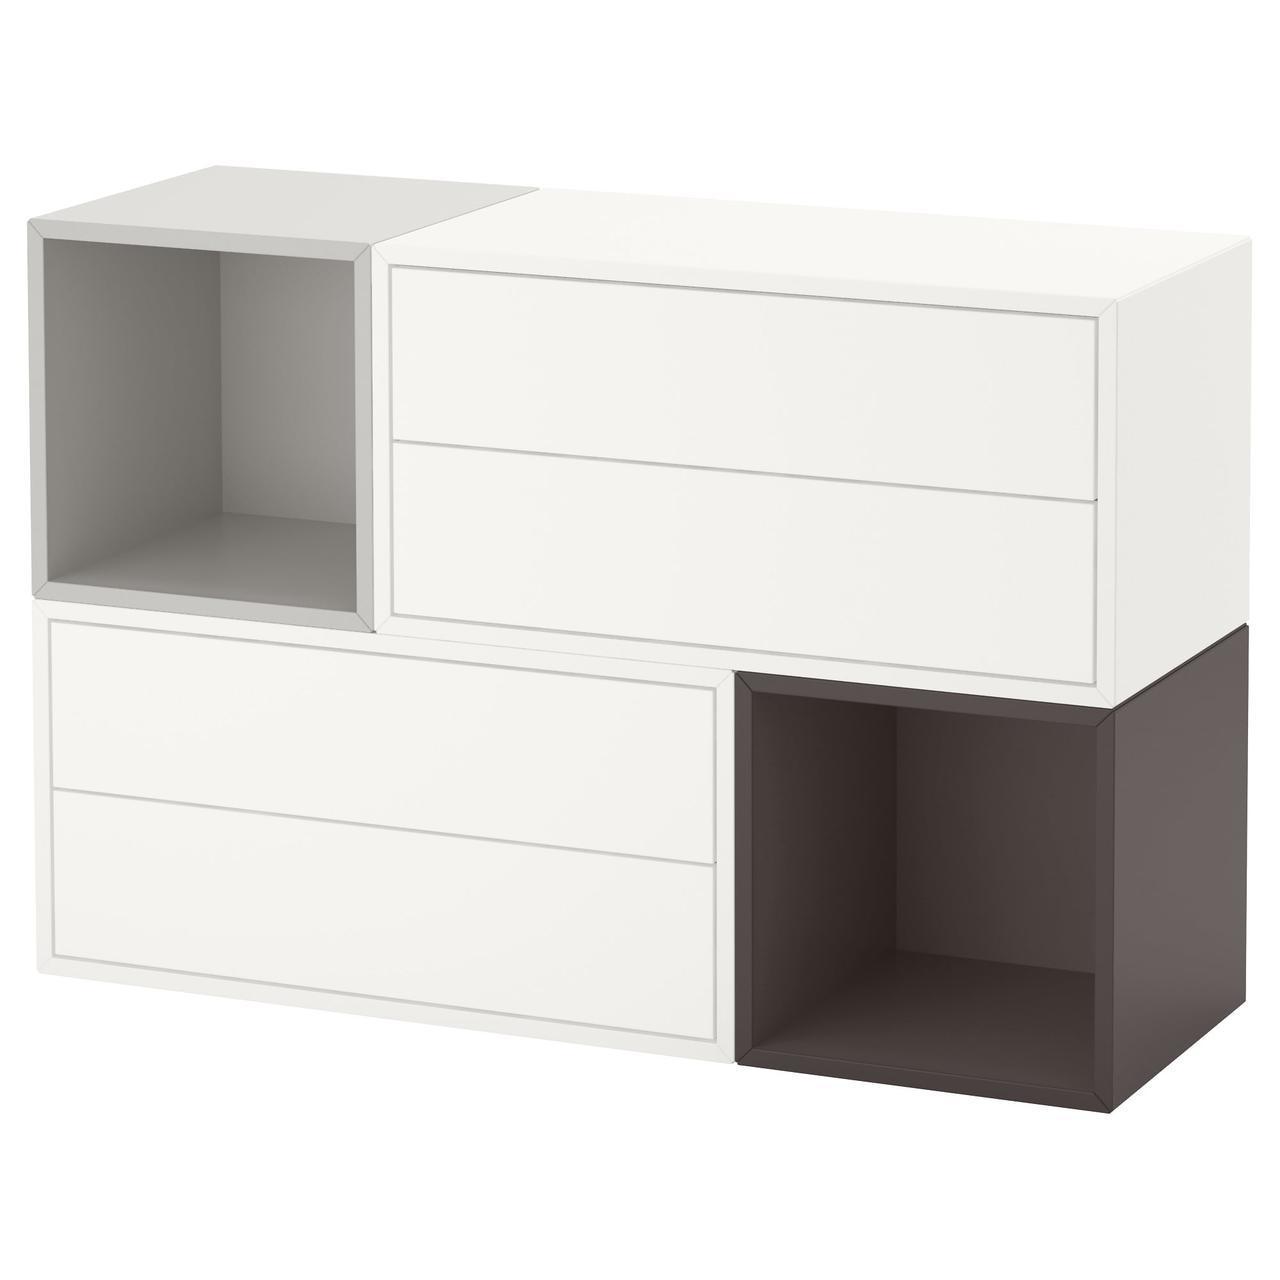 IKEA EKET (191.910.47) Комбинация настенных шкафов